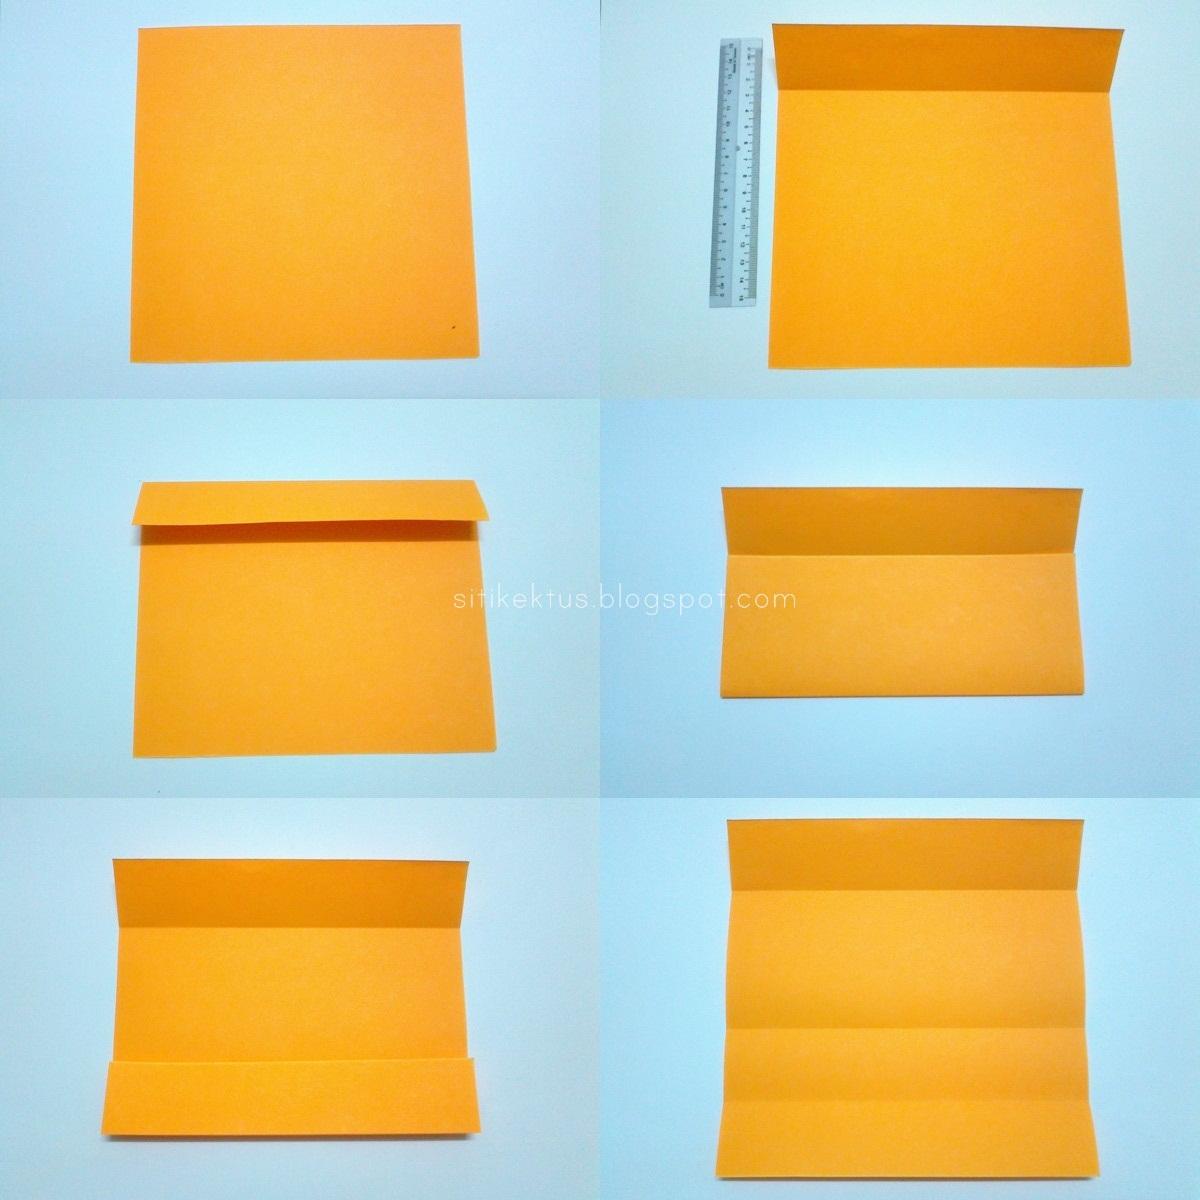 cara+buat+kotak+pandora-kotak+empatsegisama-1.jpg